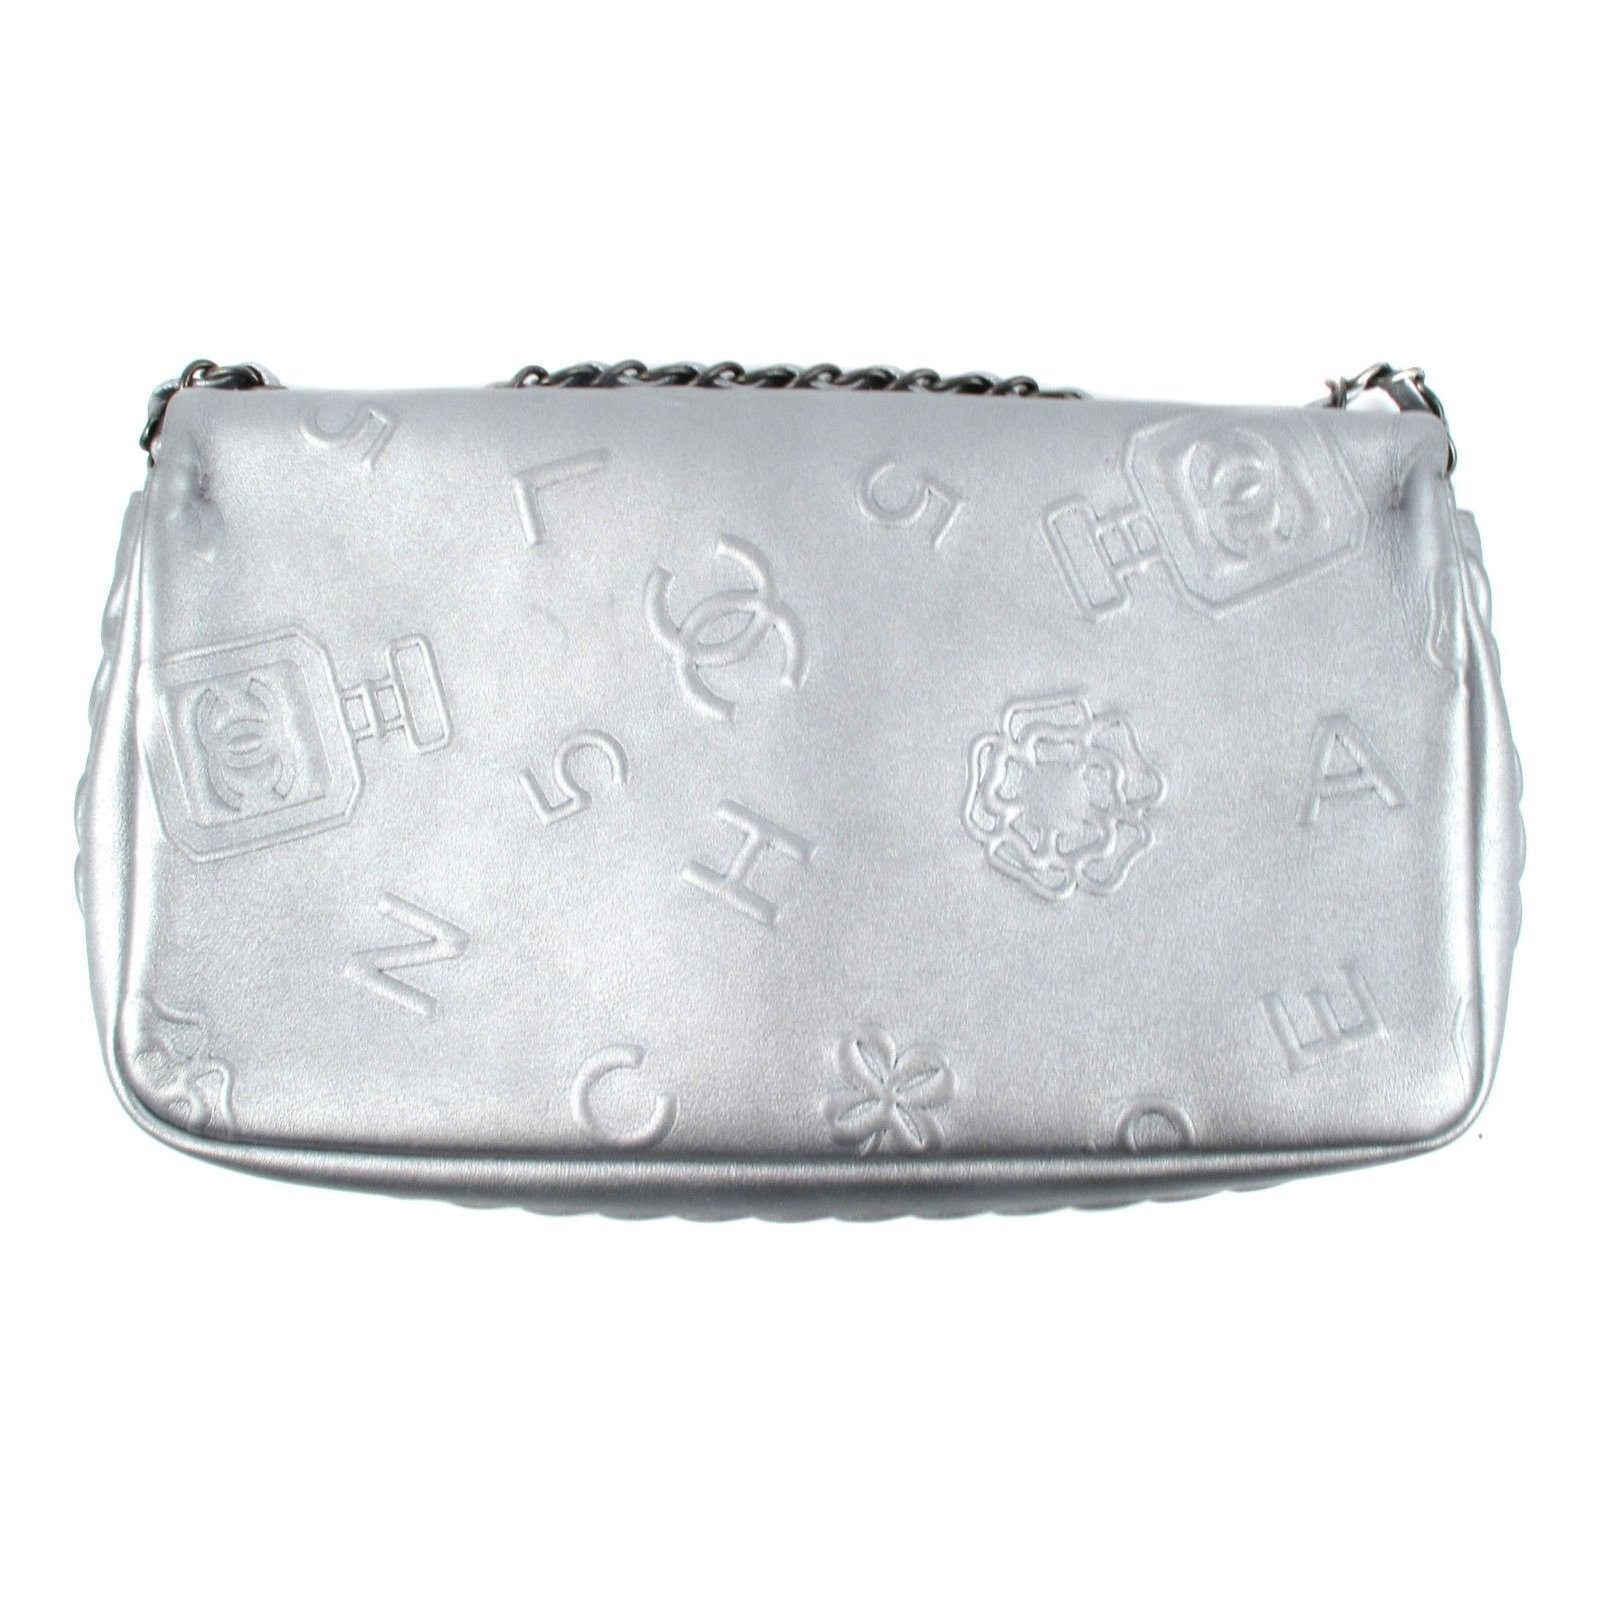 0e6ad40b4d06c3 Chanel Jumbo Lucky Charms Bag Handbags Leather Silvery ref.37031 - Joli  Closet